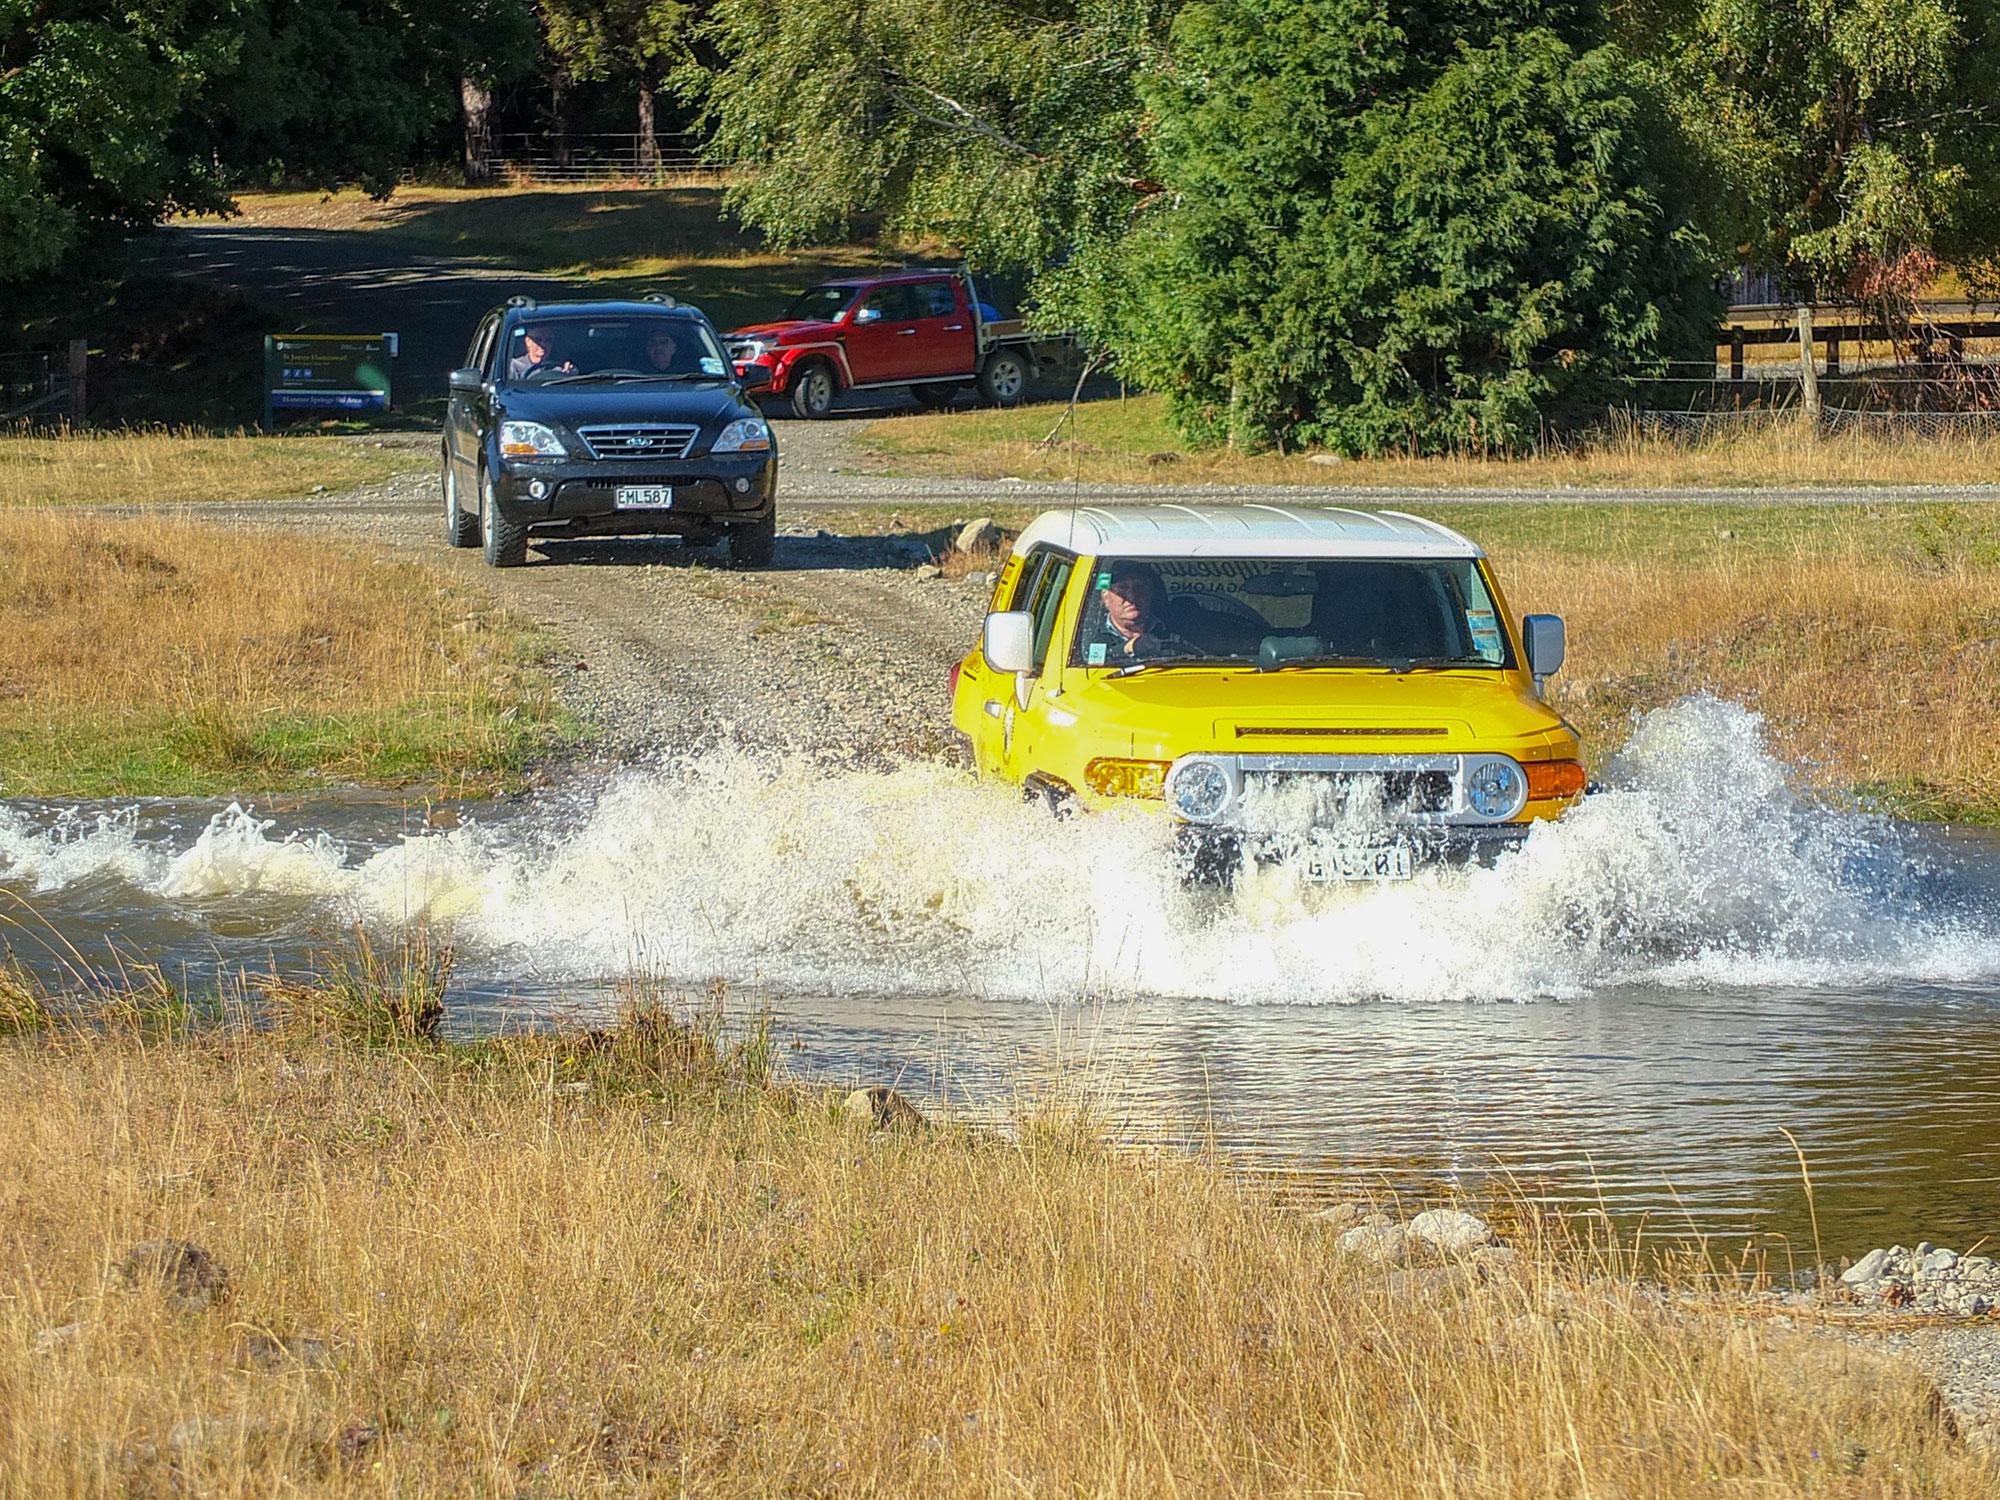 4WD tour fording a river